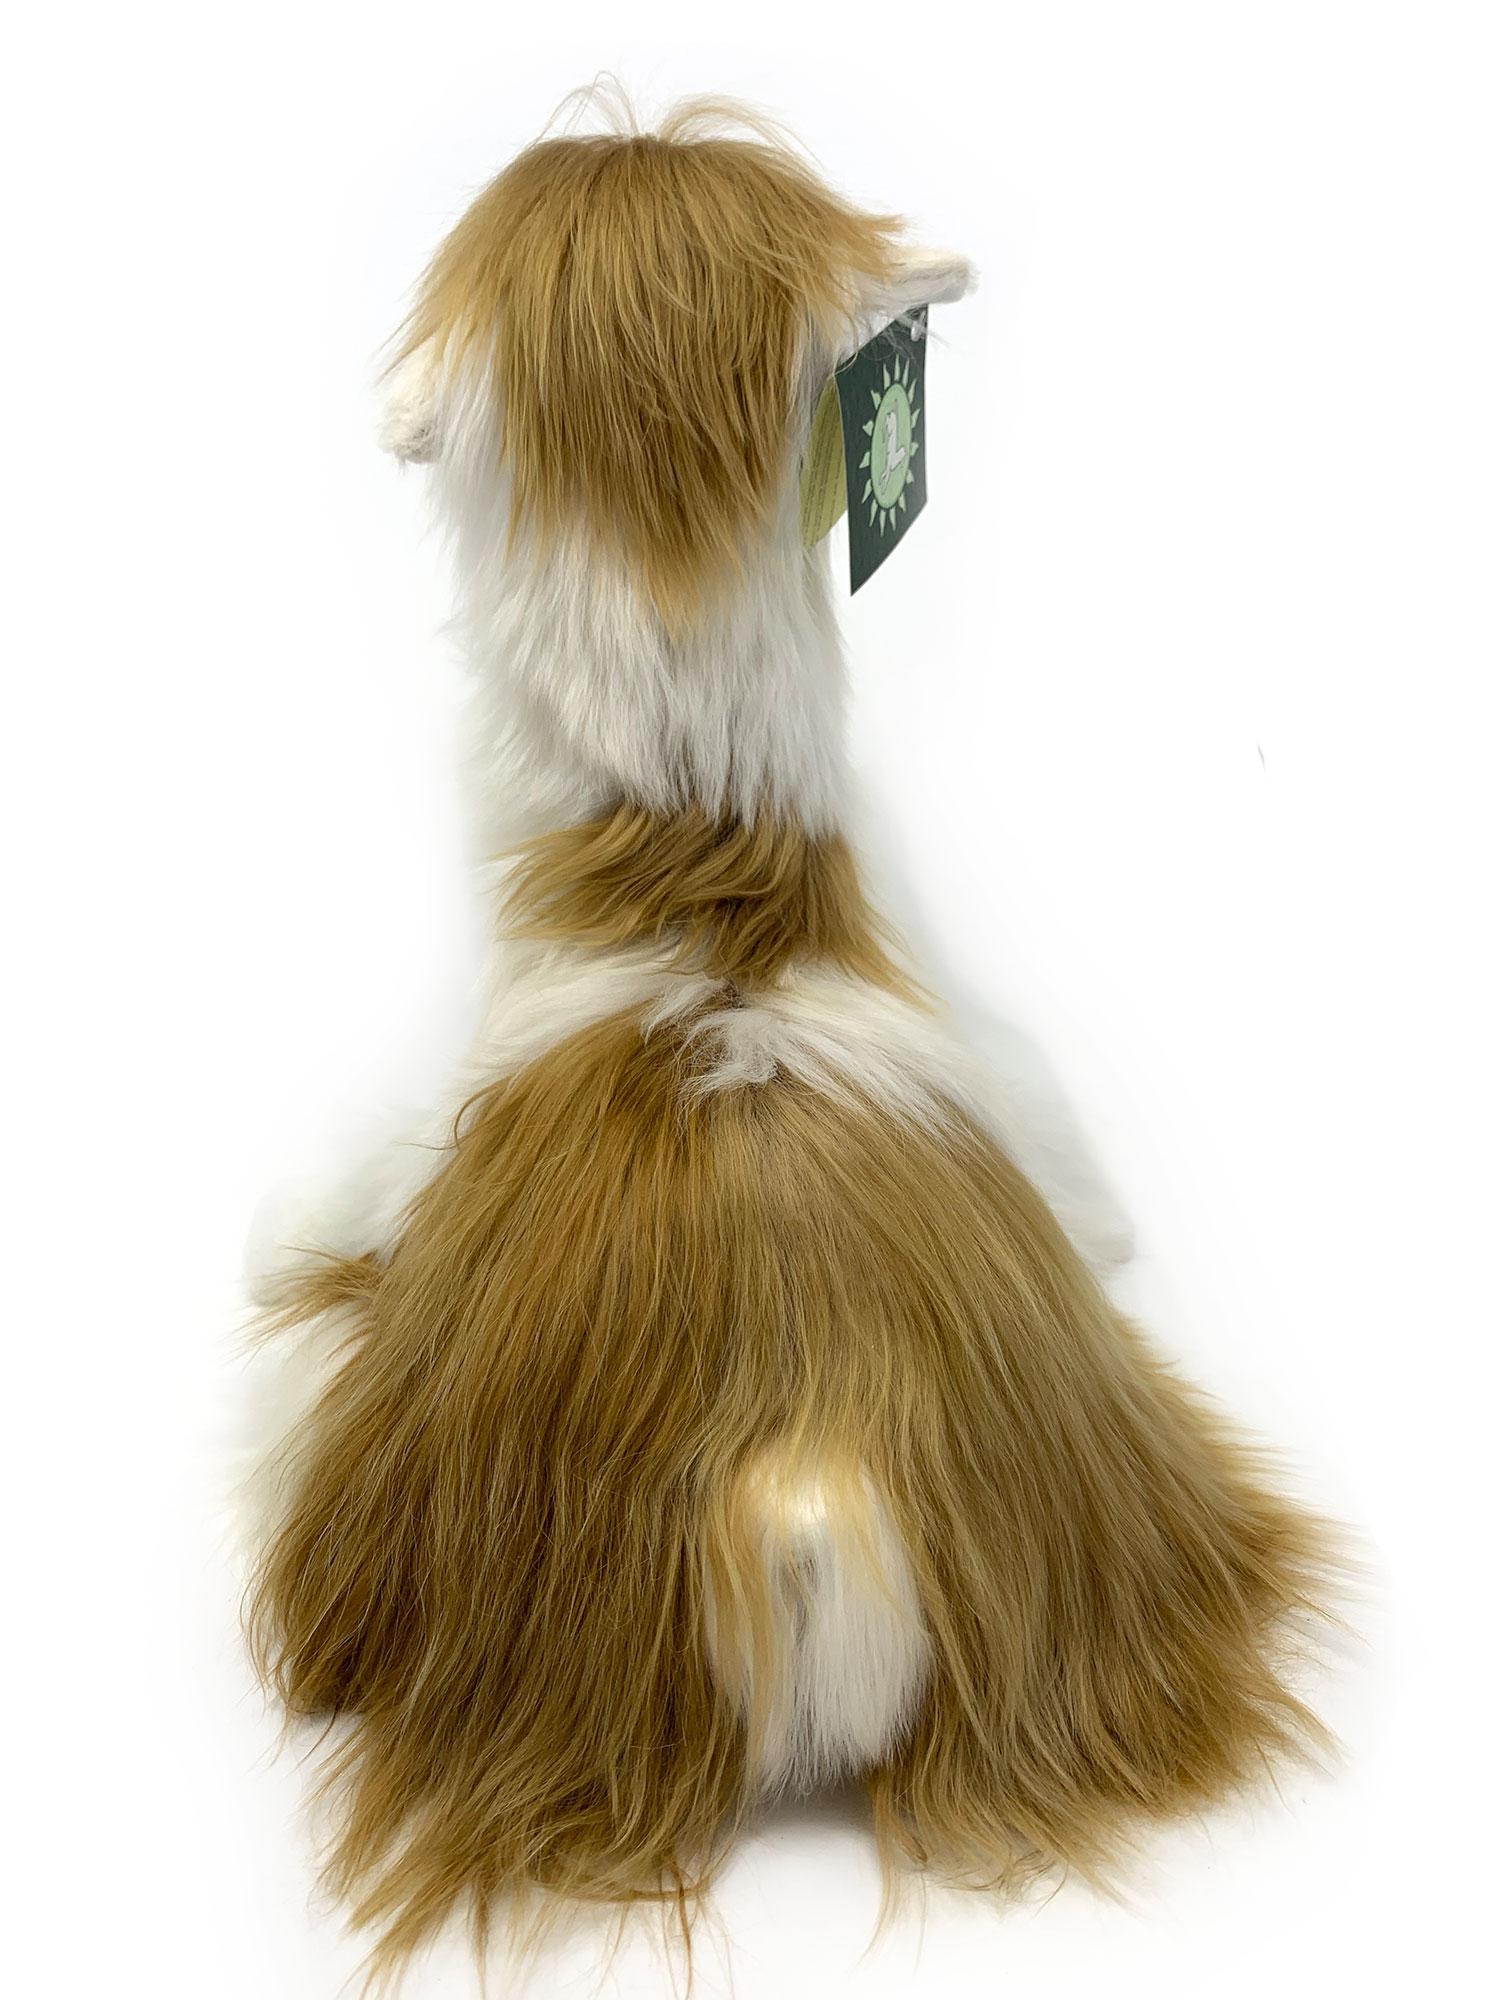 12 inch Sitting Suri Alpaca Plush Toy Multi